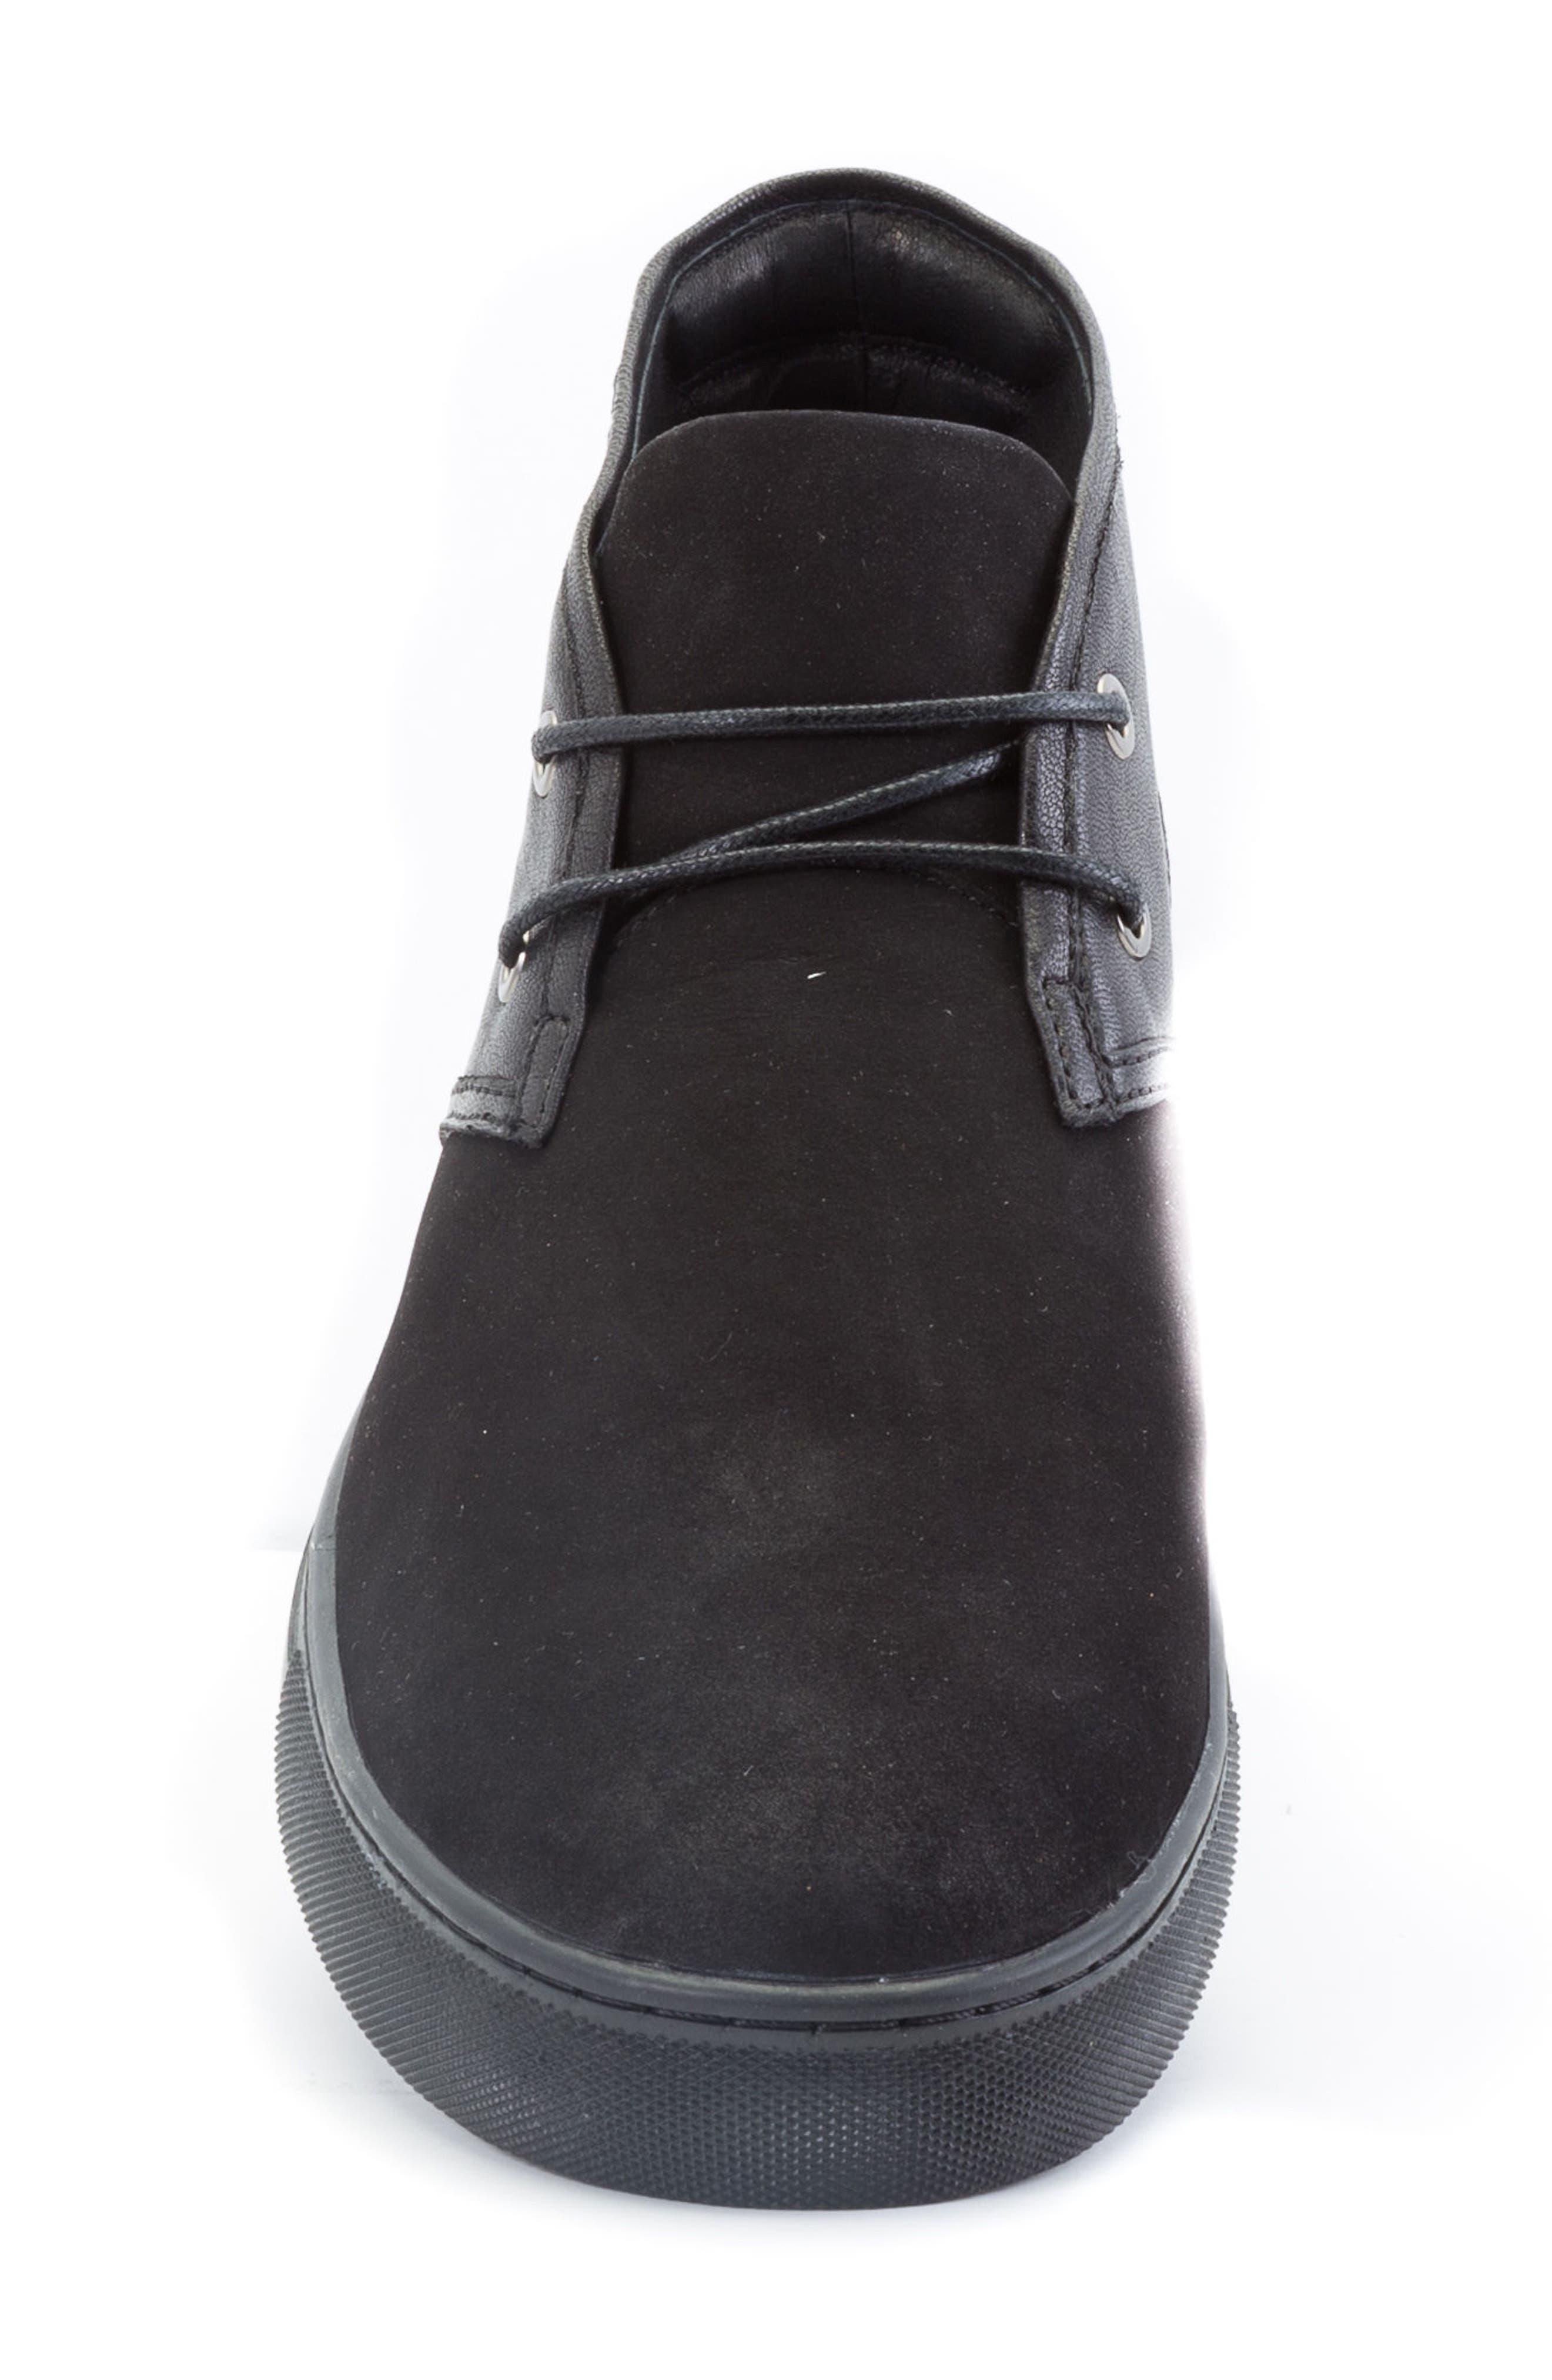 Catlett Chukka Sneaker,                             Alternate thumbnail 4, color,                             Black Suede/ Leather